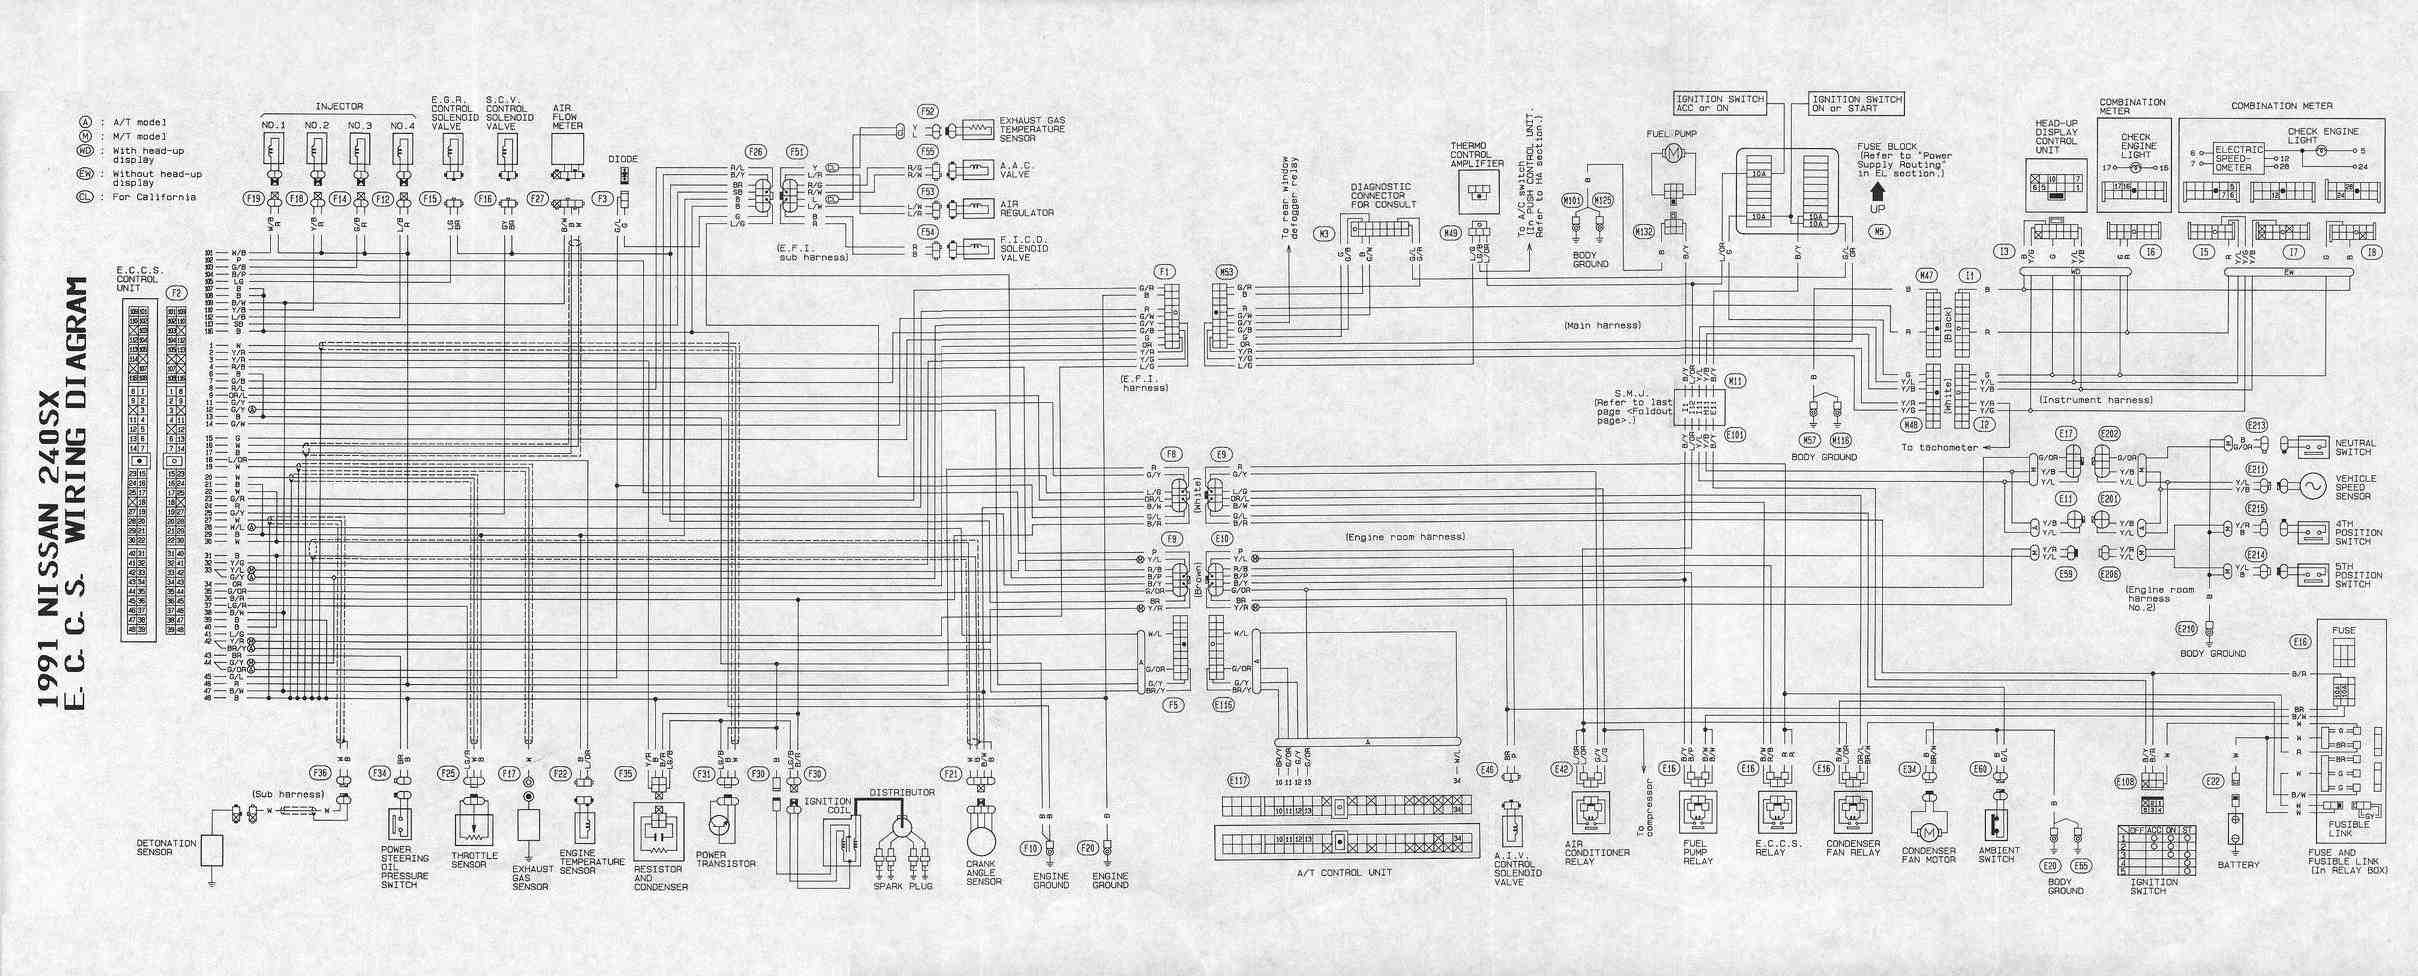 1990 Isuzu Pickup Radio Wiring Diagram Wire Data Schema 1993 Trooper On A 97 Nissan 240 And 1988 Electrical